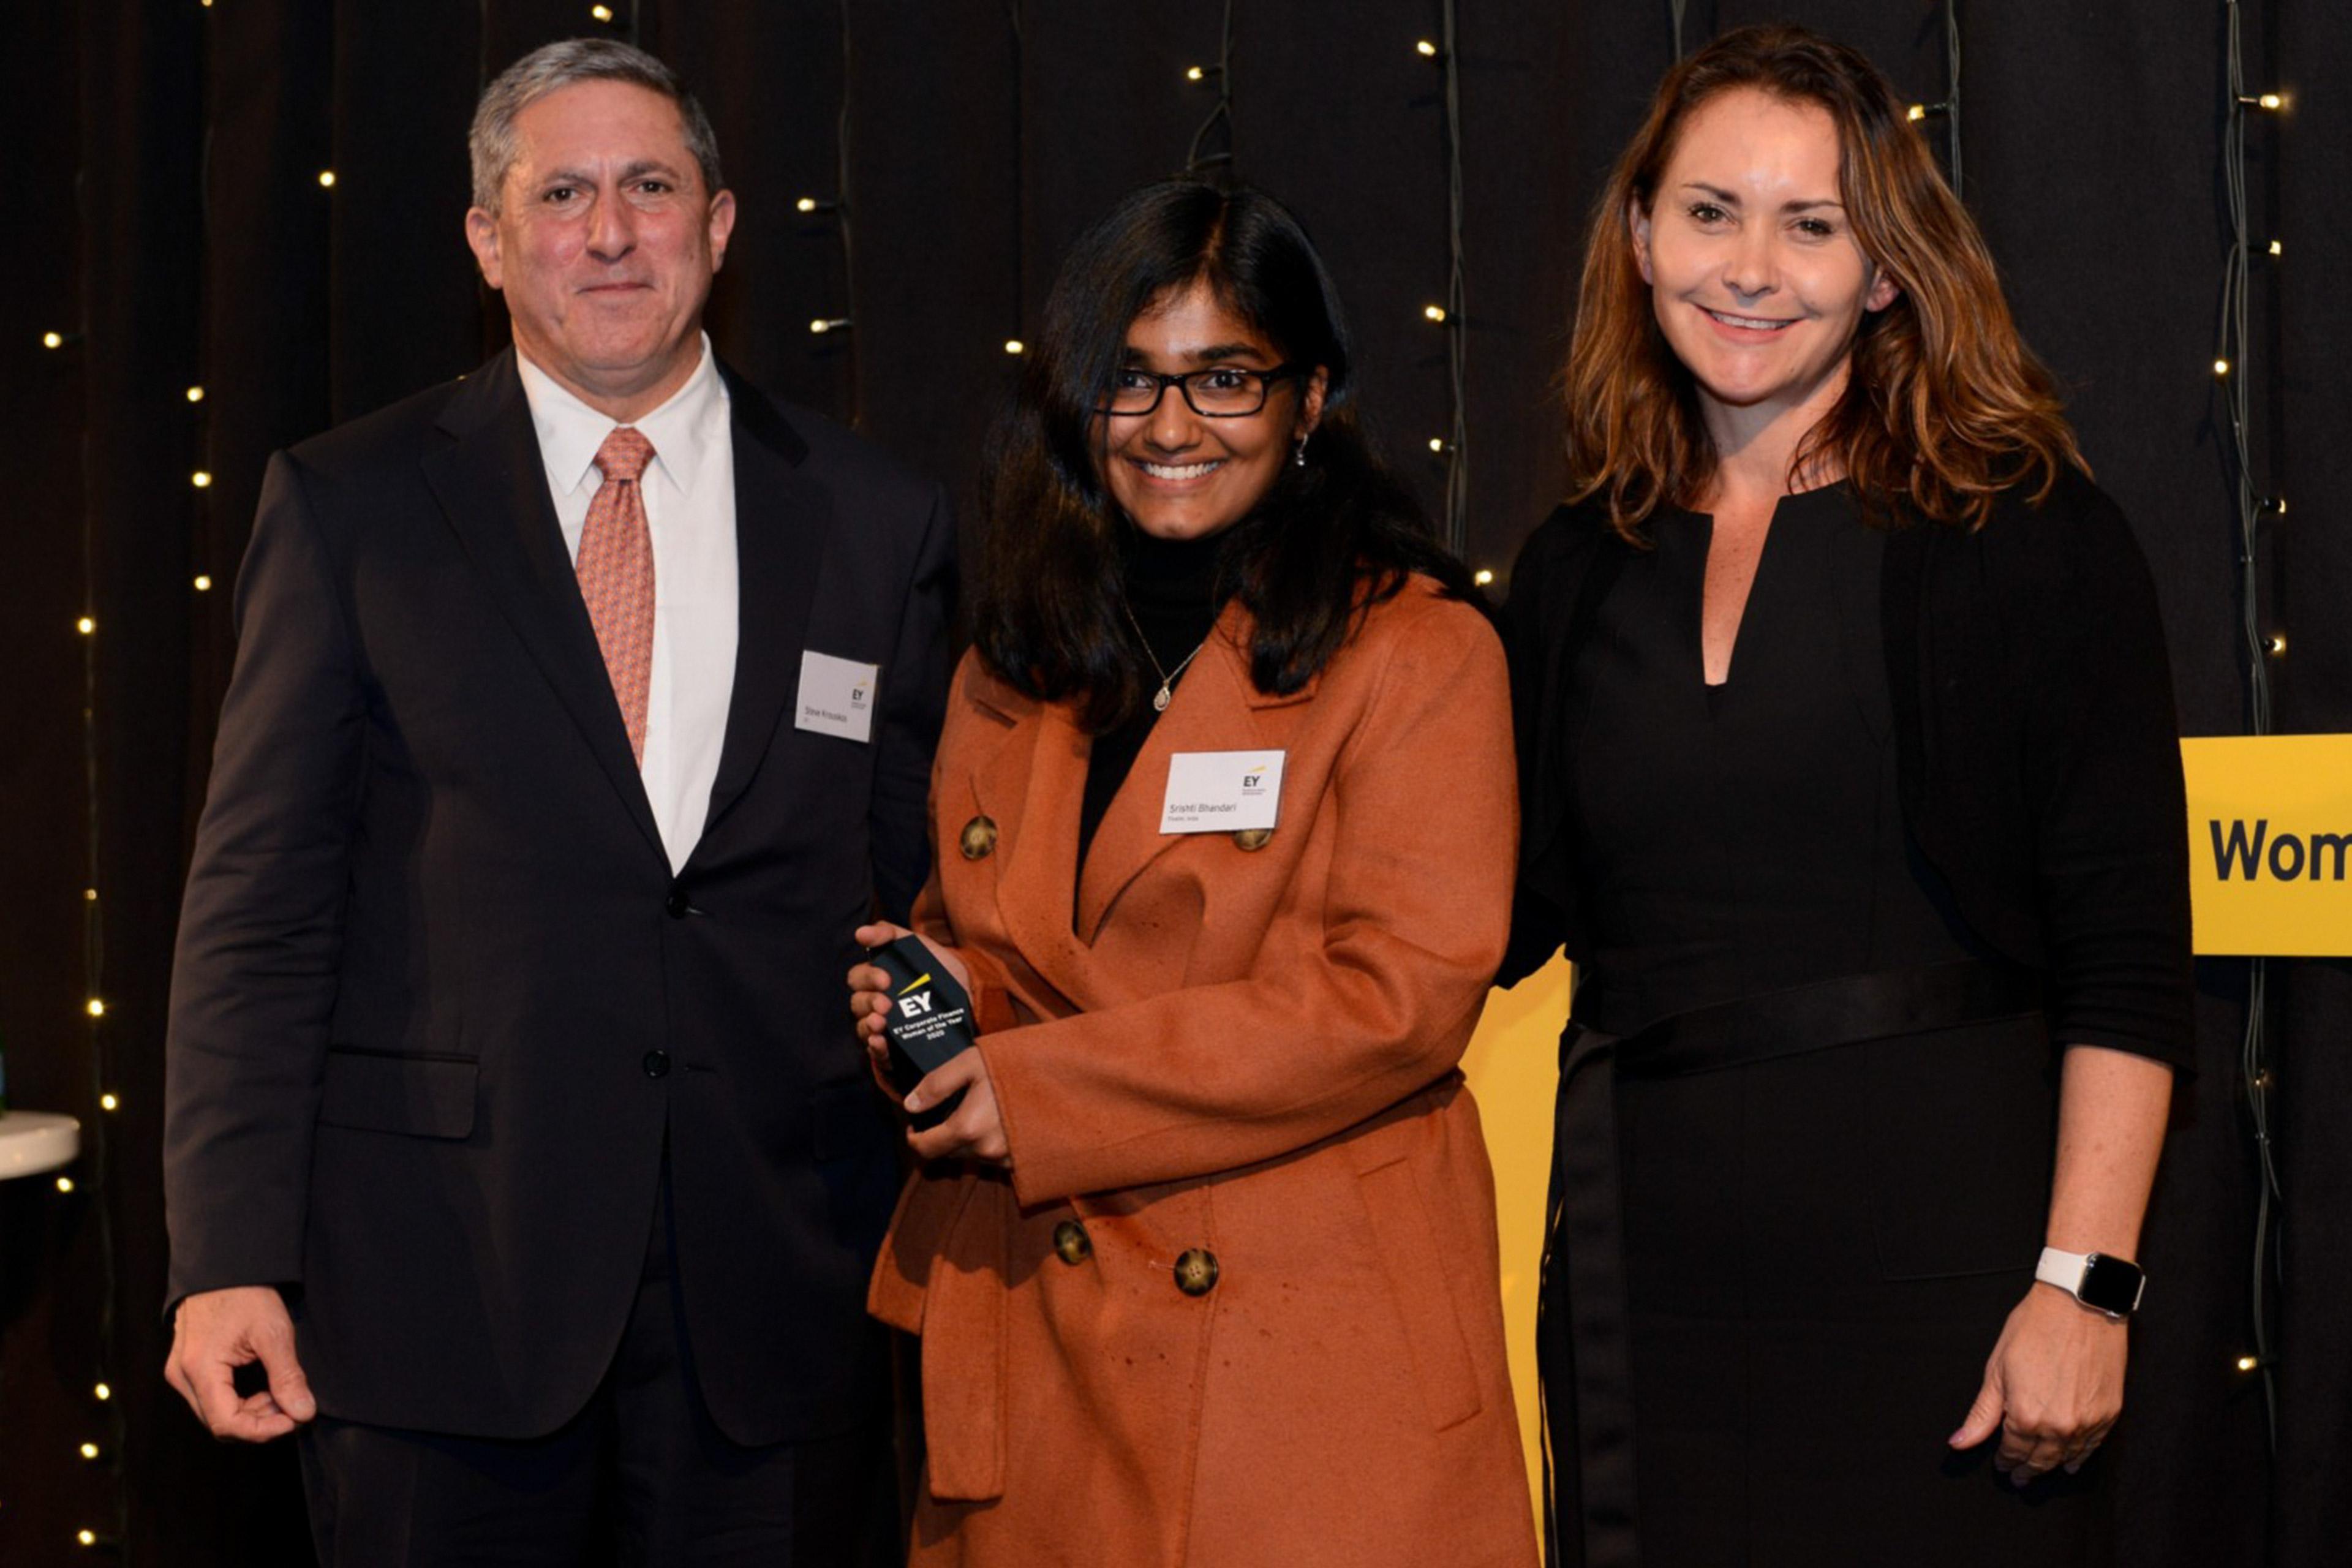 Corporate finance woman of the year winner 2020